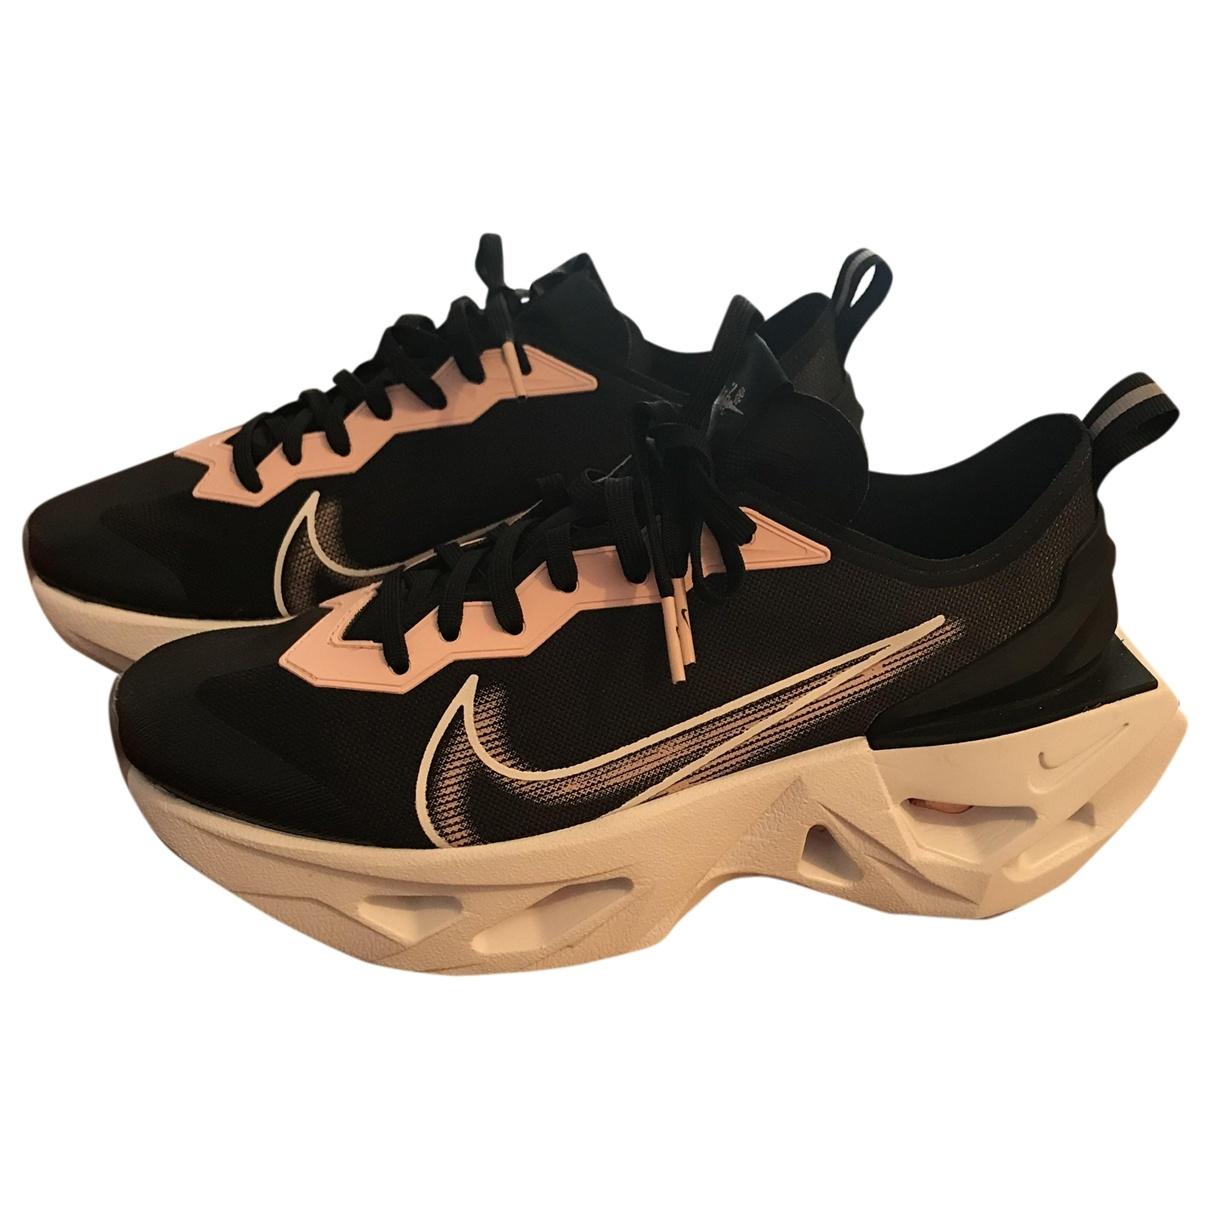 Nike Zoom X Vista Grind Sneakers in  Schwarz Leinen